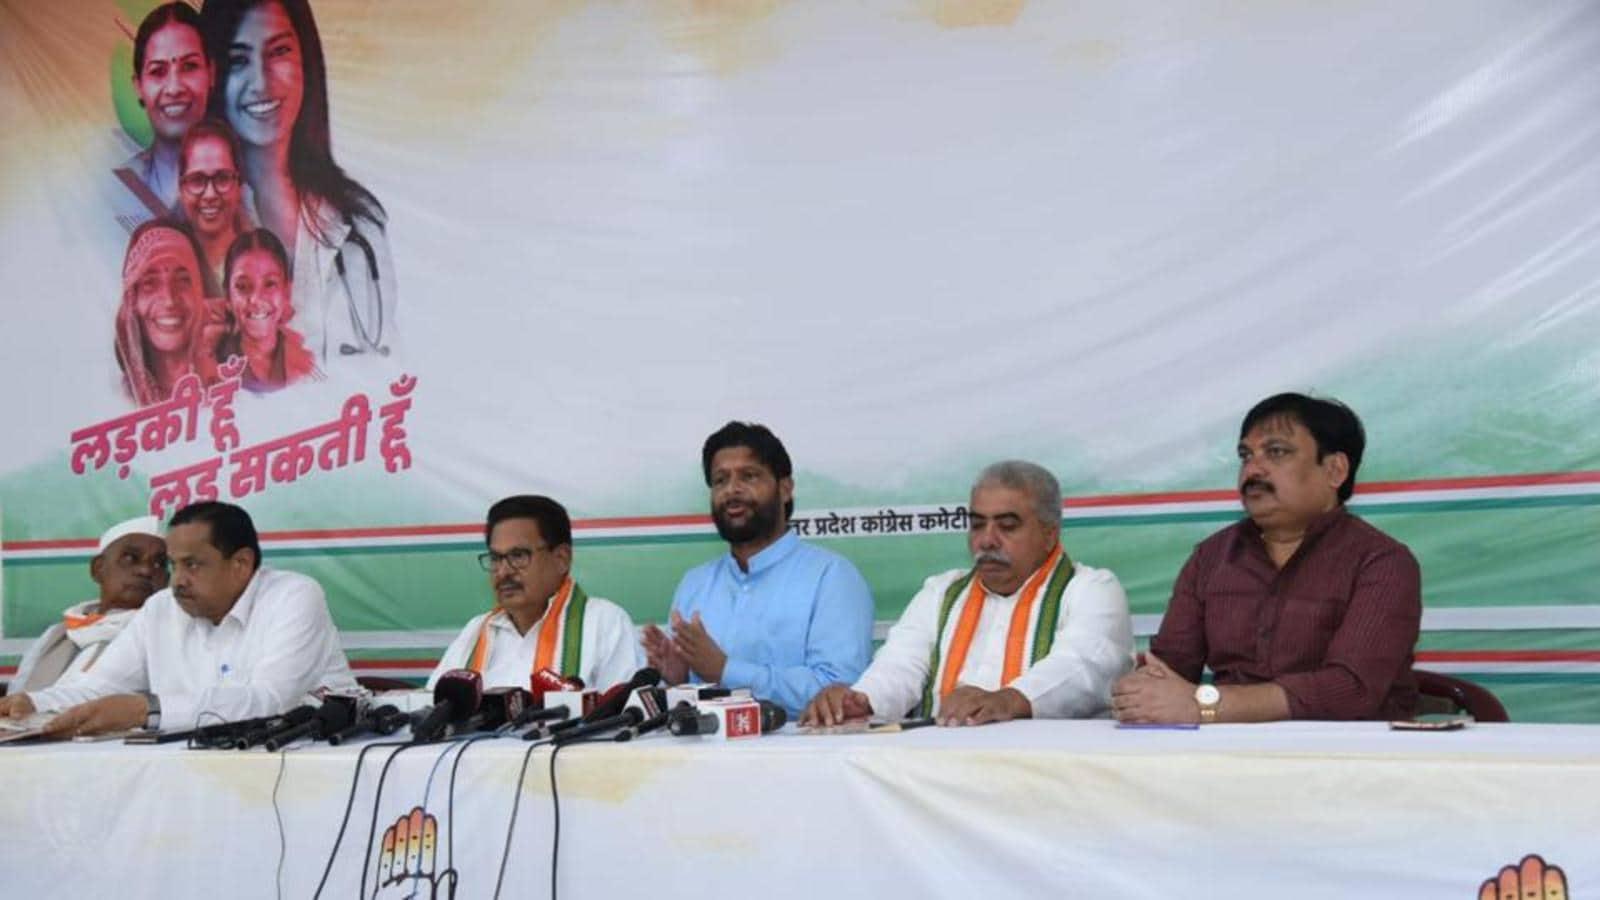 Uttar Pradesh Congress to launch fourth pratigya yatra from Gorakhpur after Diwali